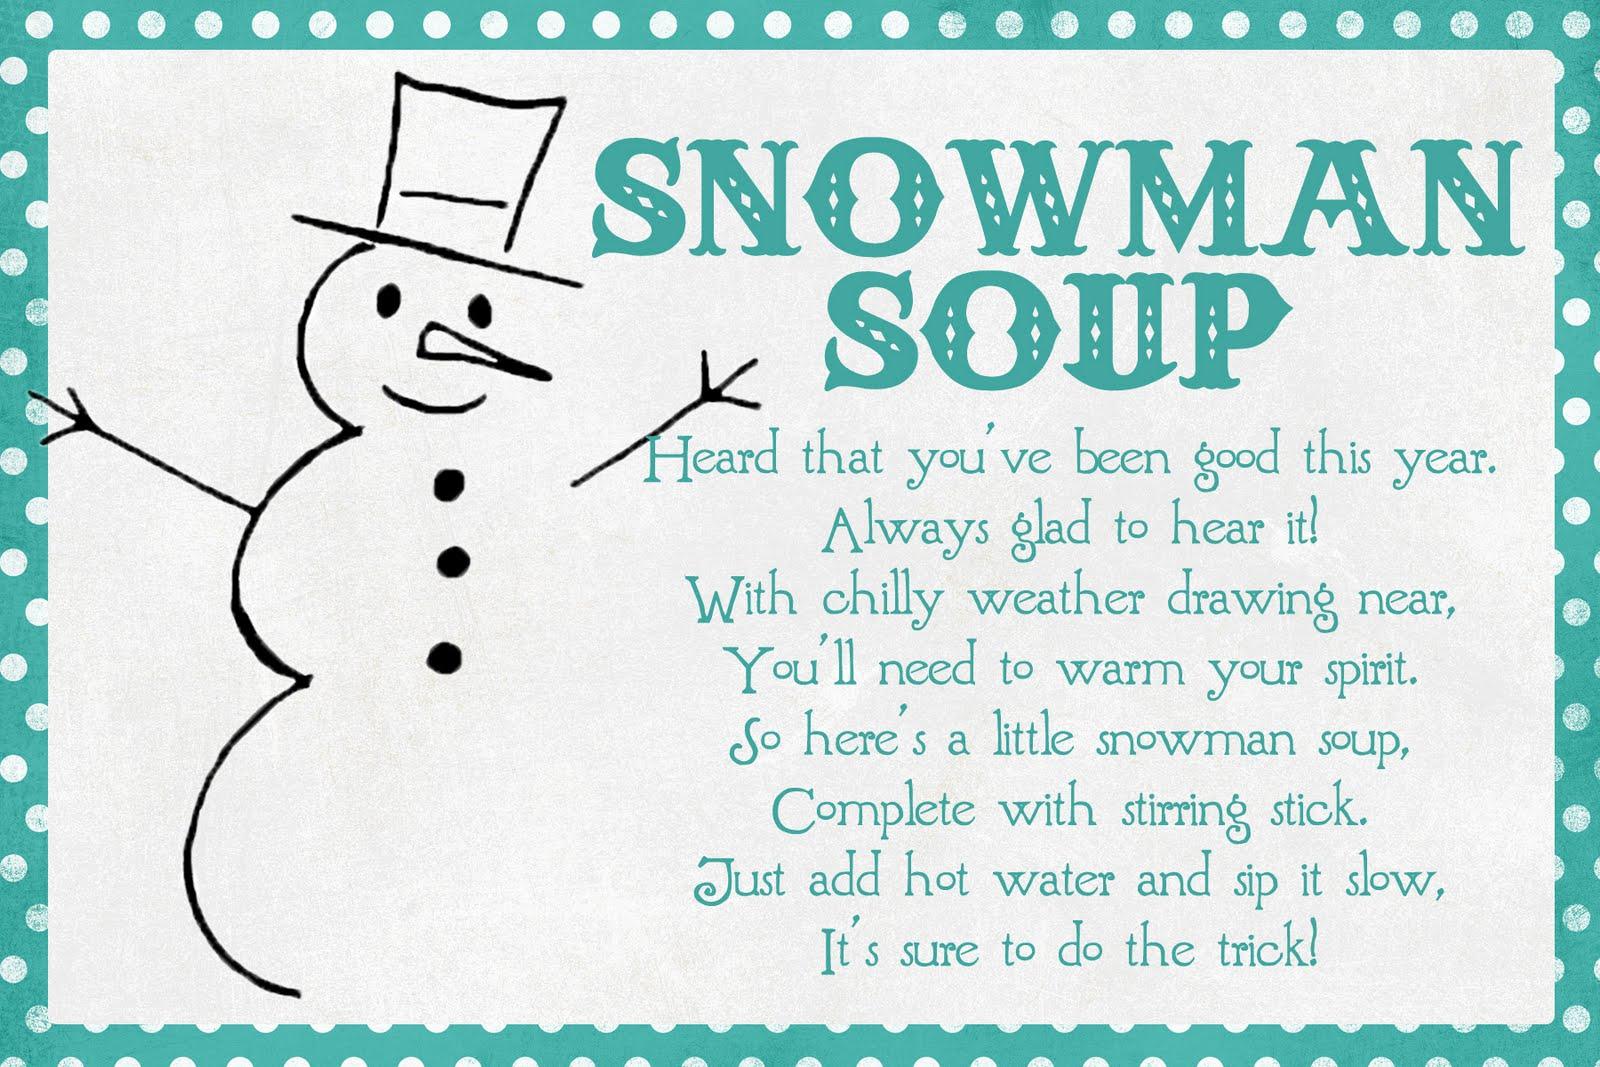 Funky Polkadot Giraffe January Fun Snowman Soup